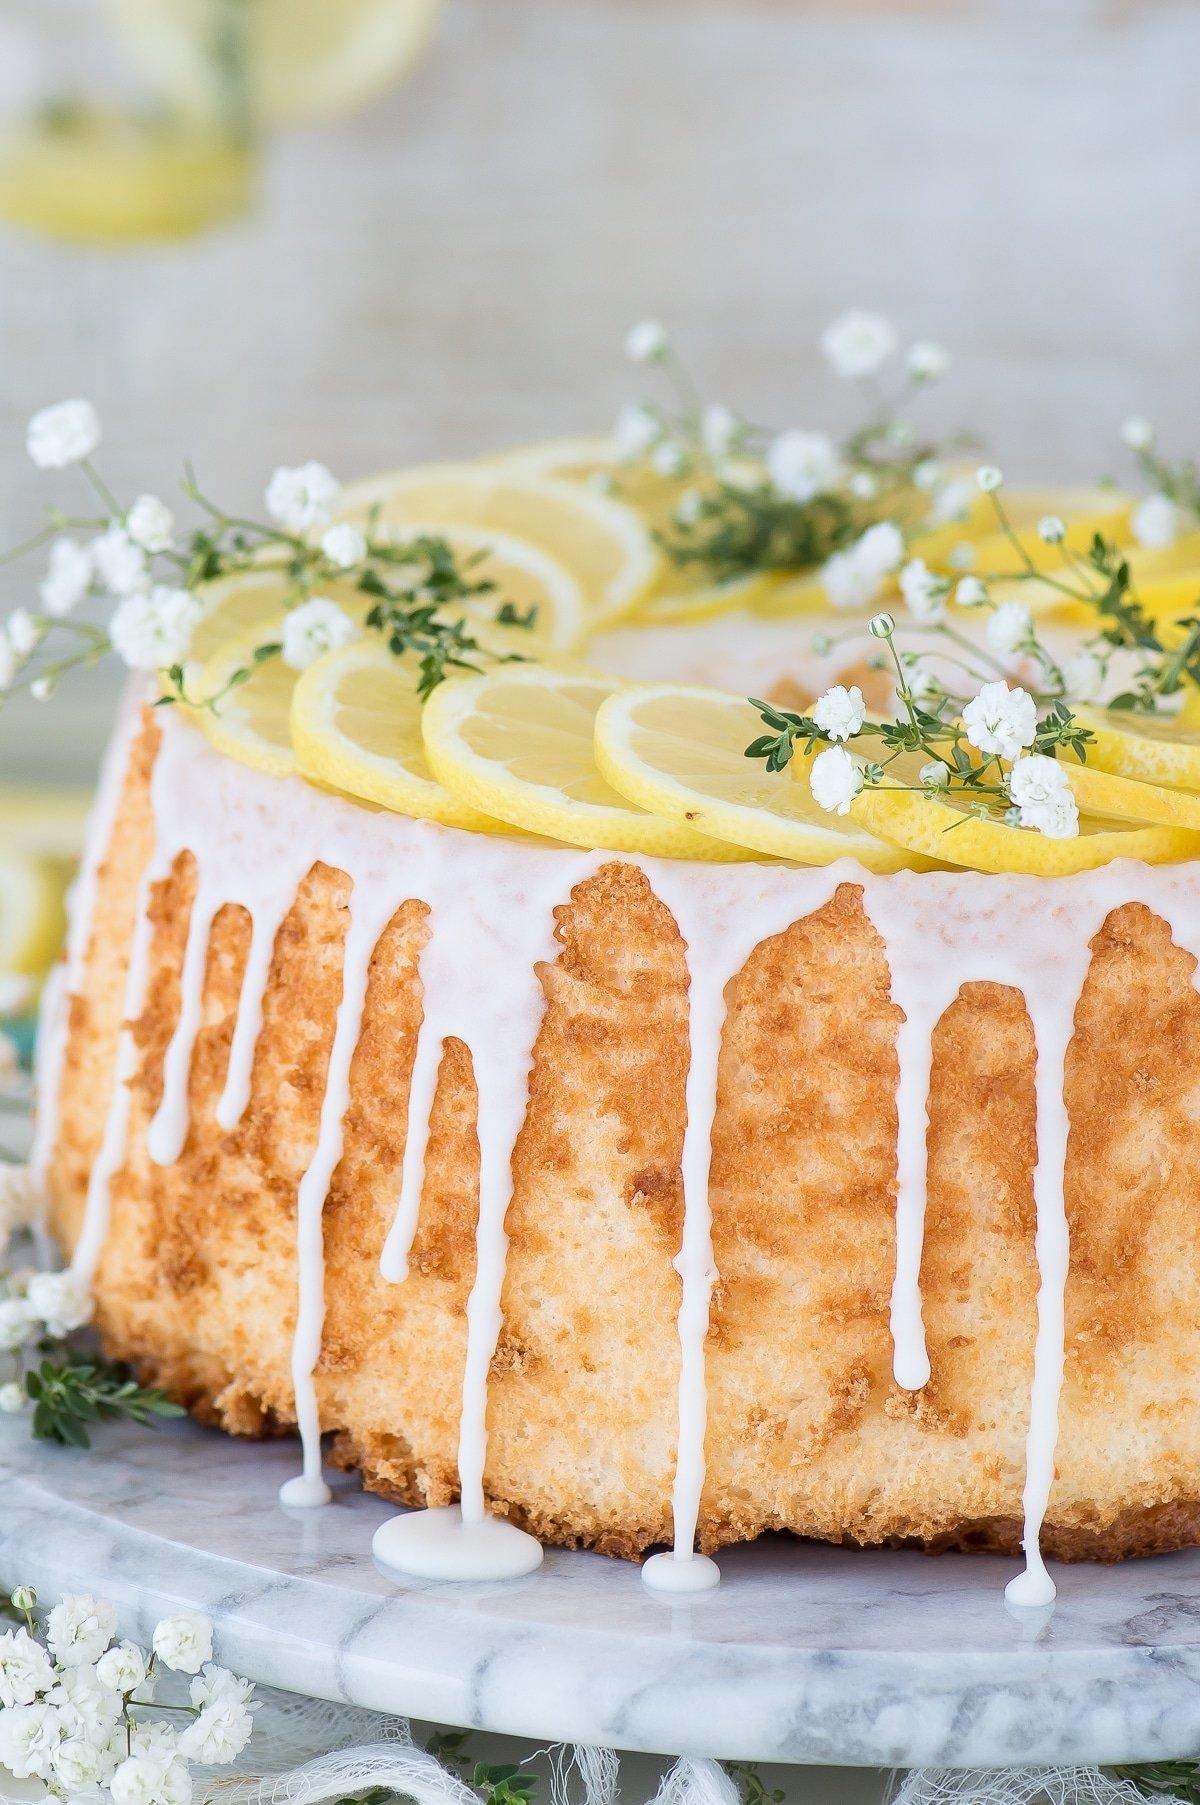 10 Famous Angel Food Cake Recipe Ideas lemon angel food cake the first year 2020